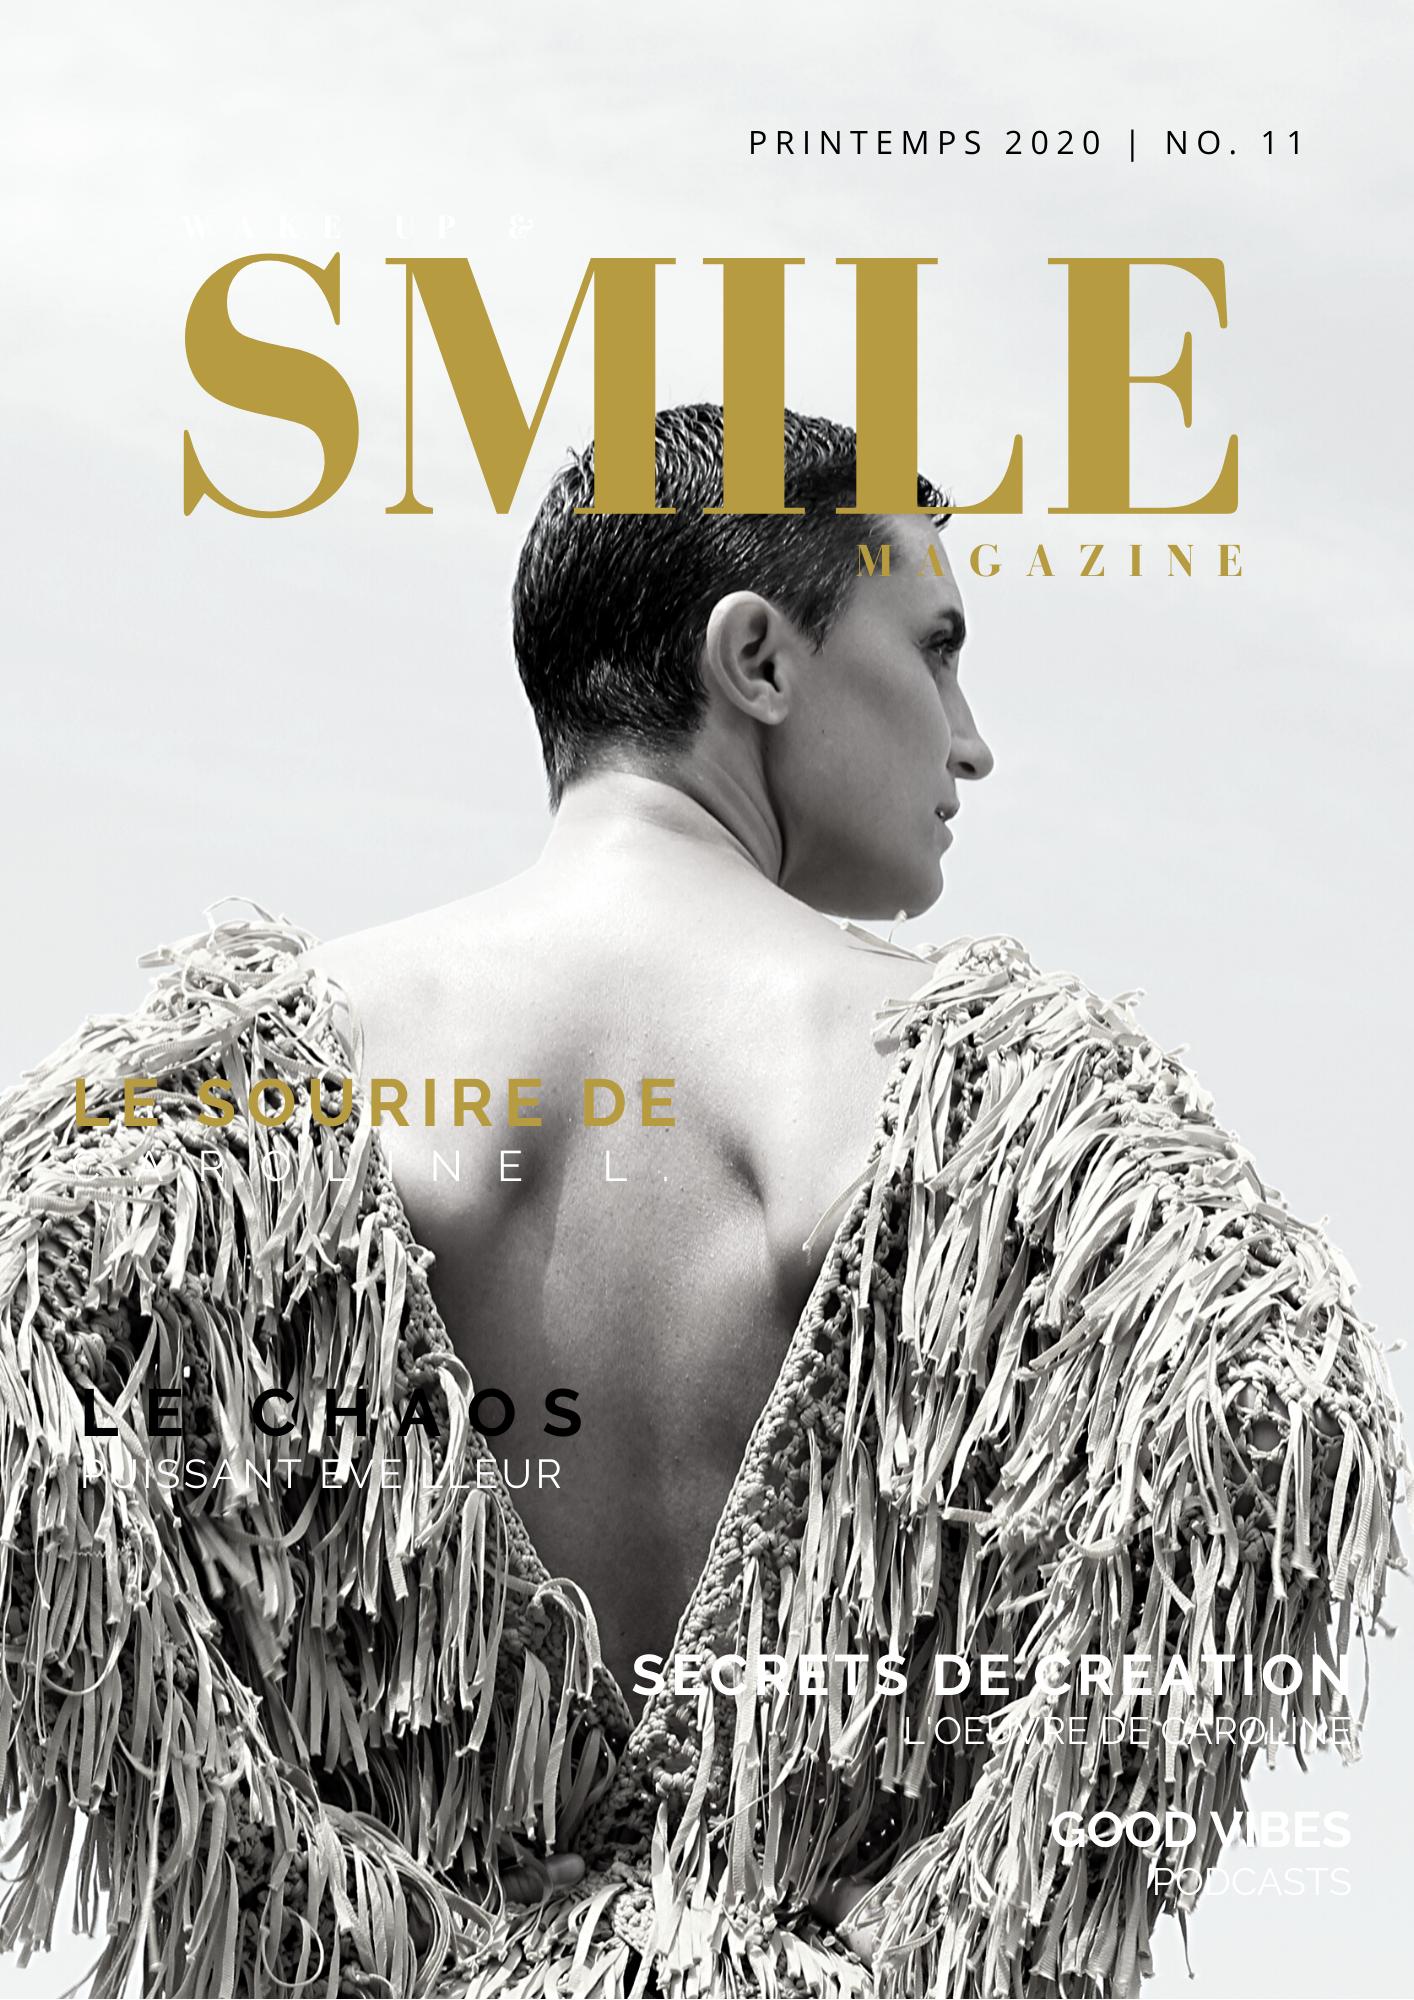 Wake Up & Smile Magazine Printemps 2020